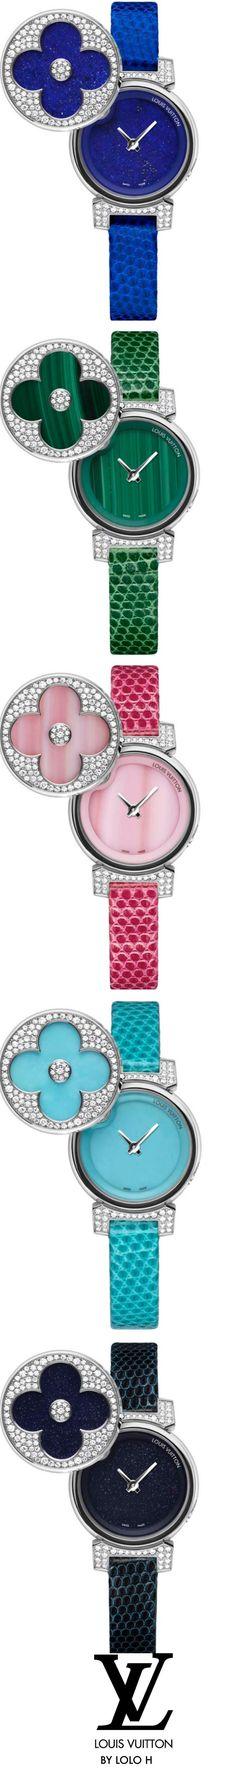 Louis Vuitton Tambour Bijou Secret Watches.